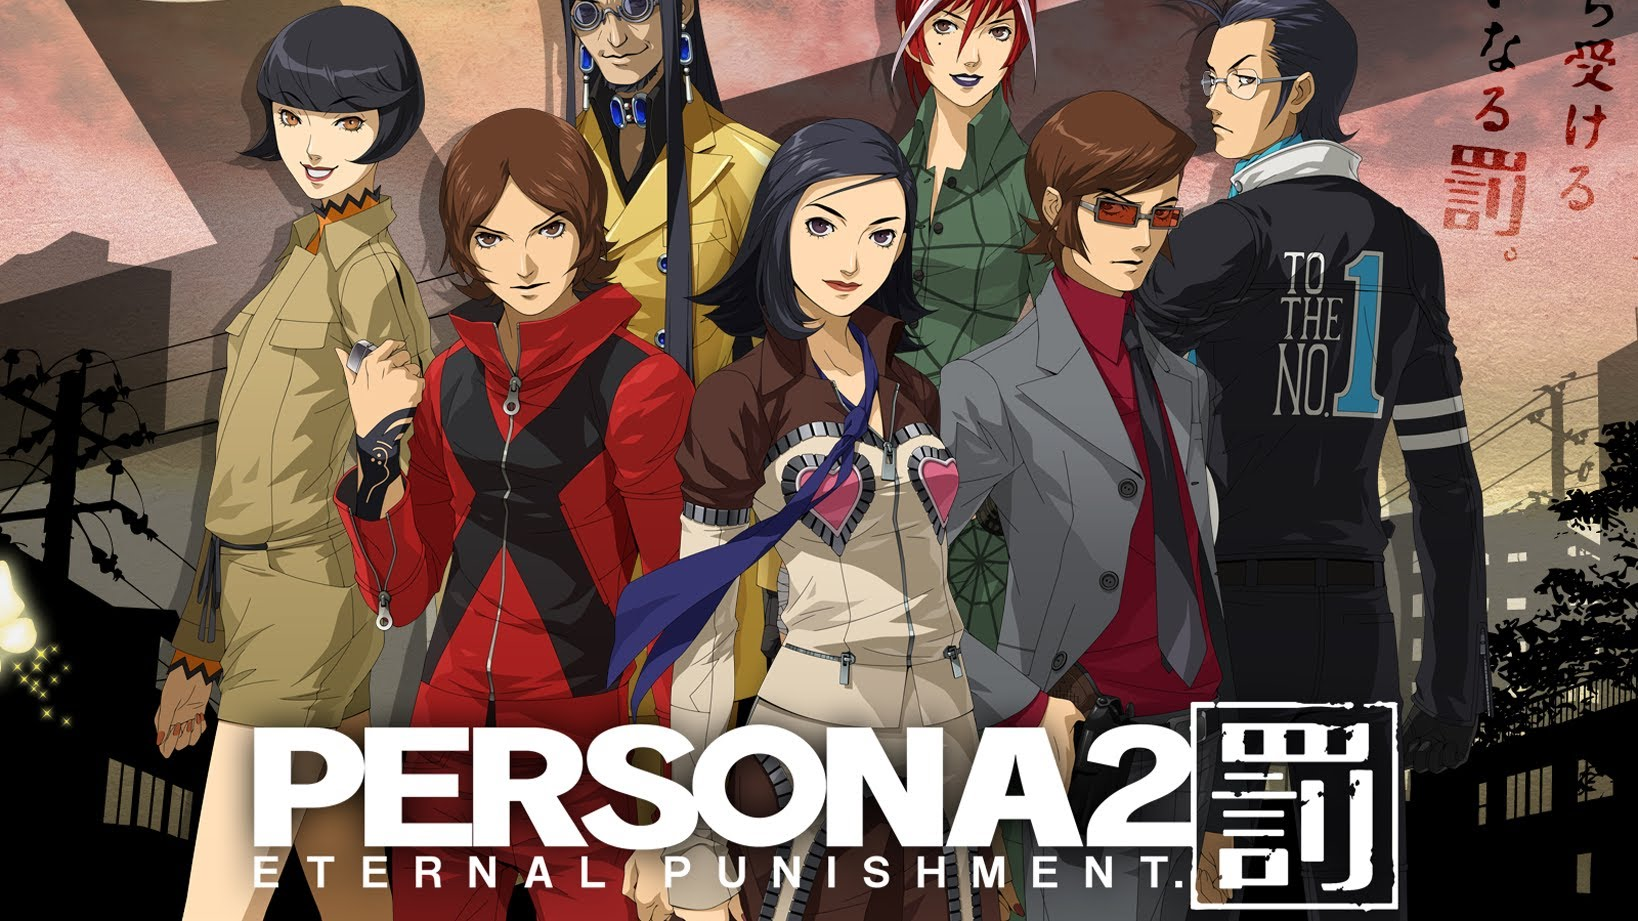 High Resolution Wallpaper | Persona 2: Eternal Punishment 1638x921 px